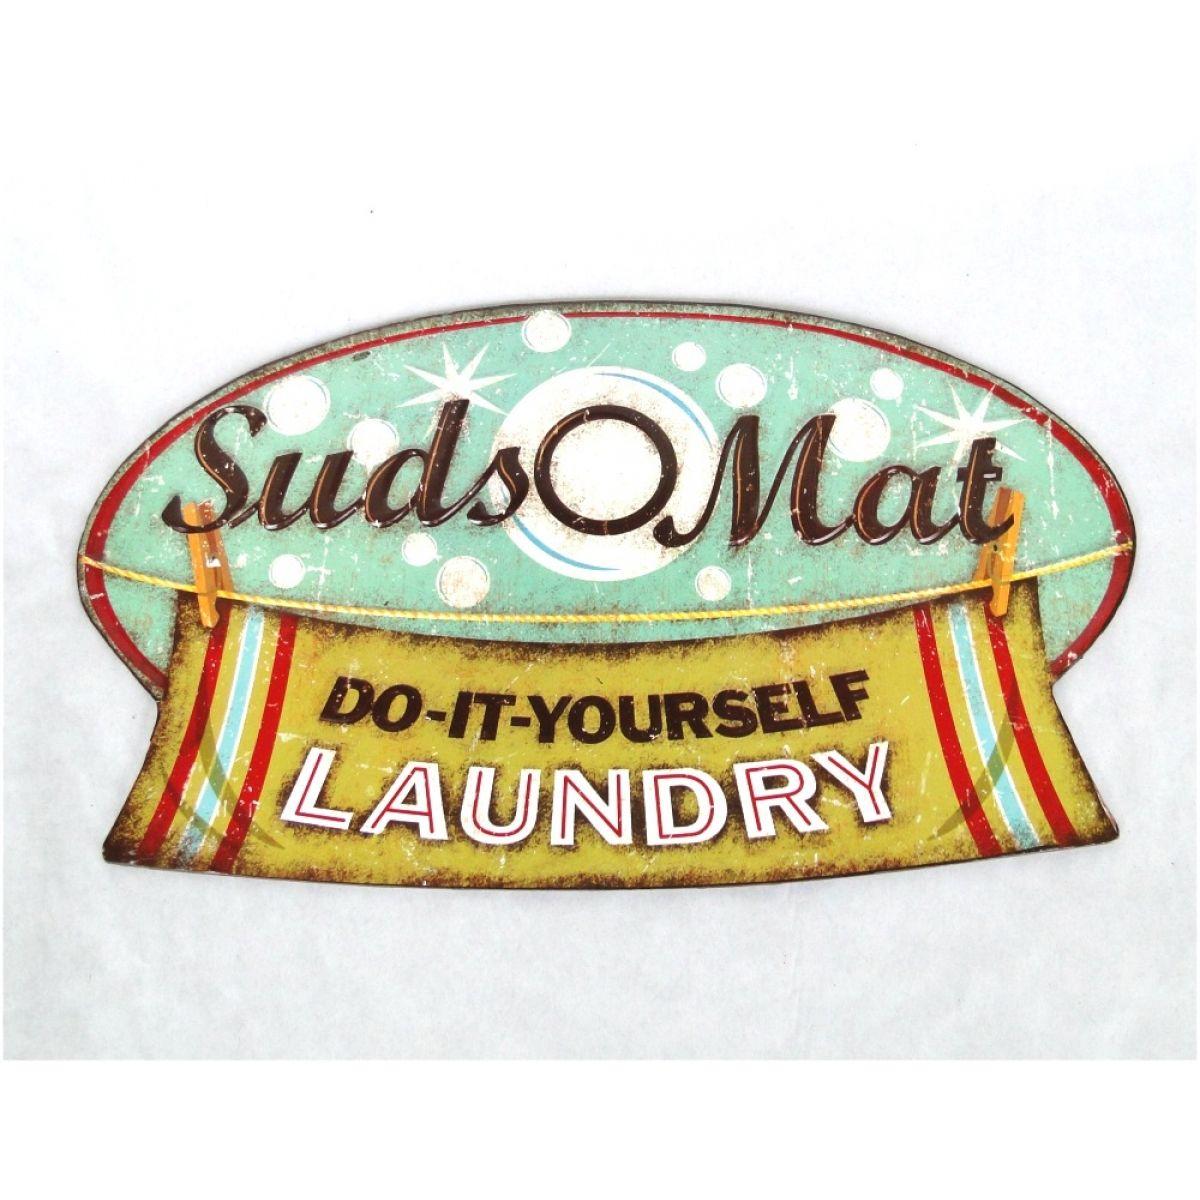 Vintage Laundromat Sign Tin Suds Laundromat Retro Wall Sign Vintage Replica  Laundry